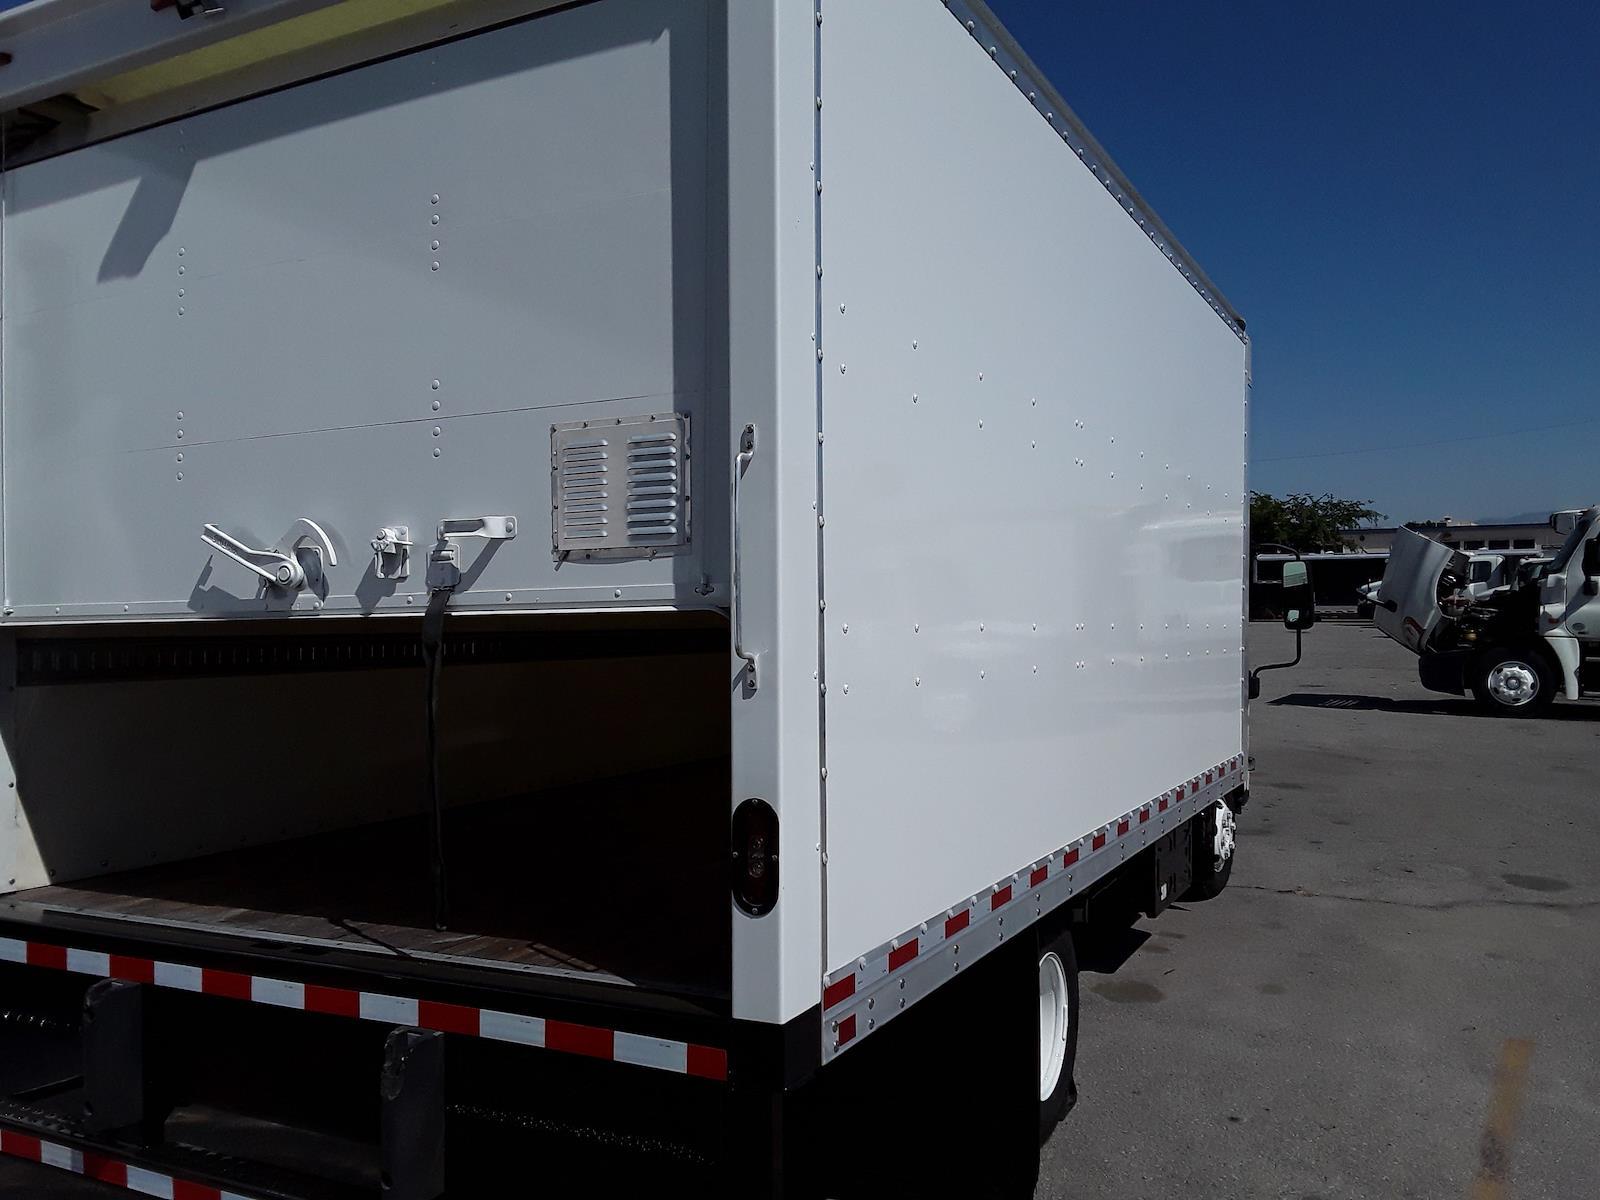 2017 Isuzu NPR-HD Regular Cab 4x2, Dry Freight #671766 - photo 1